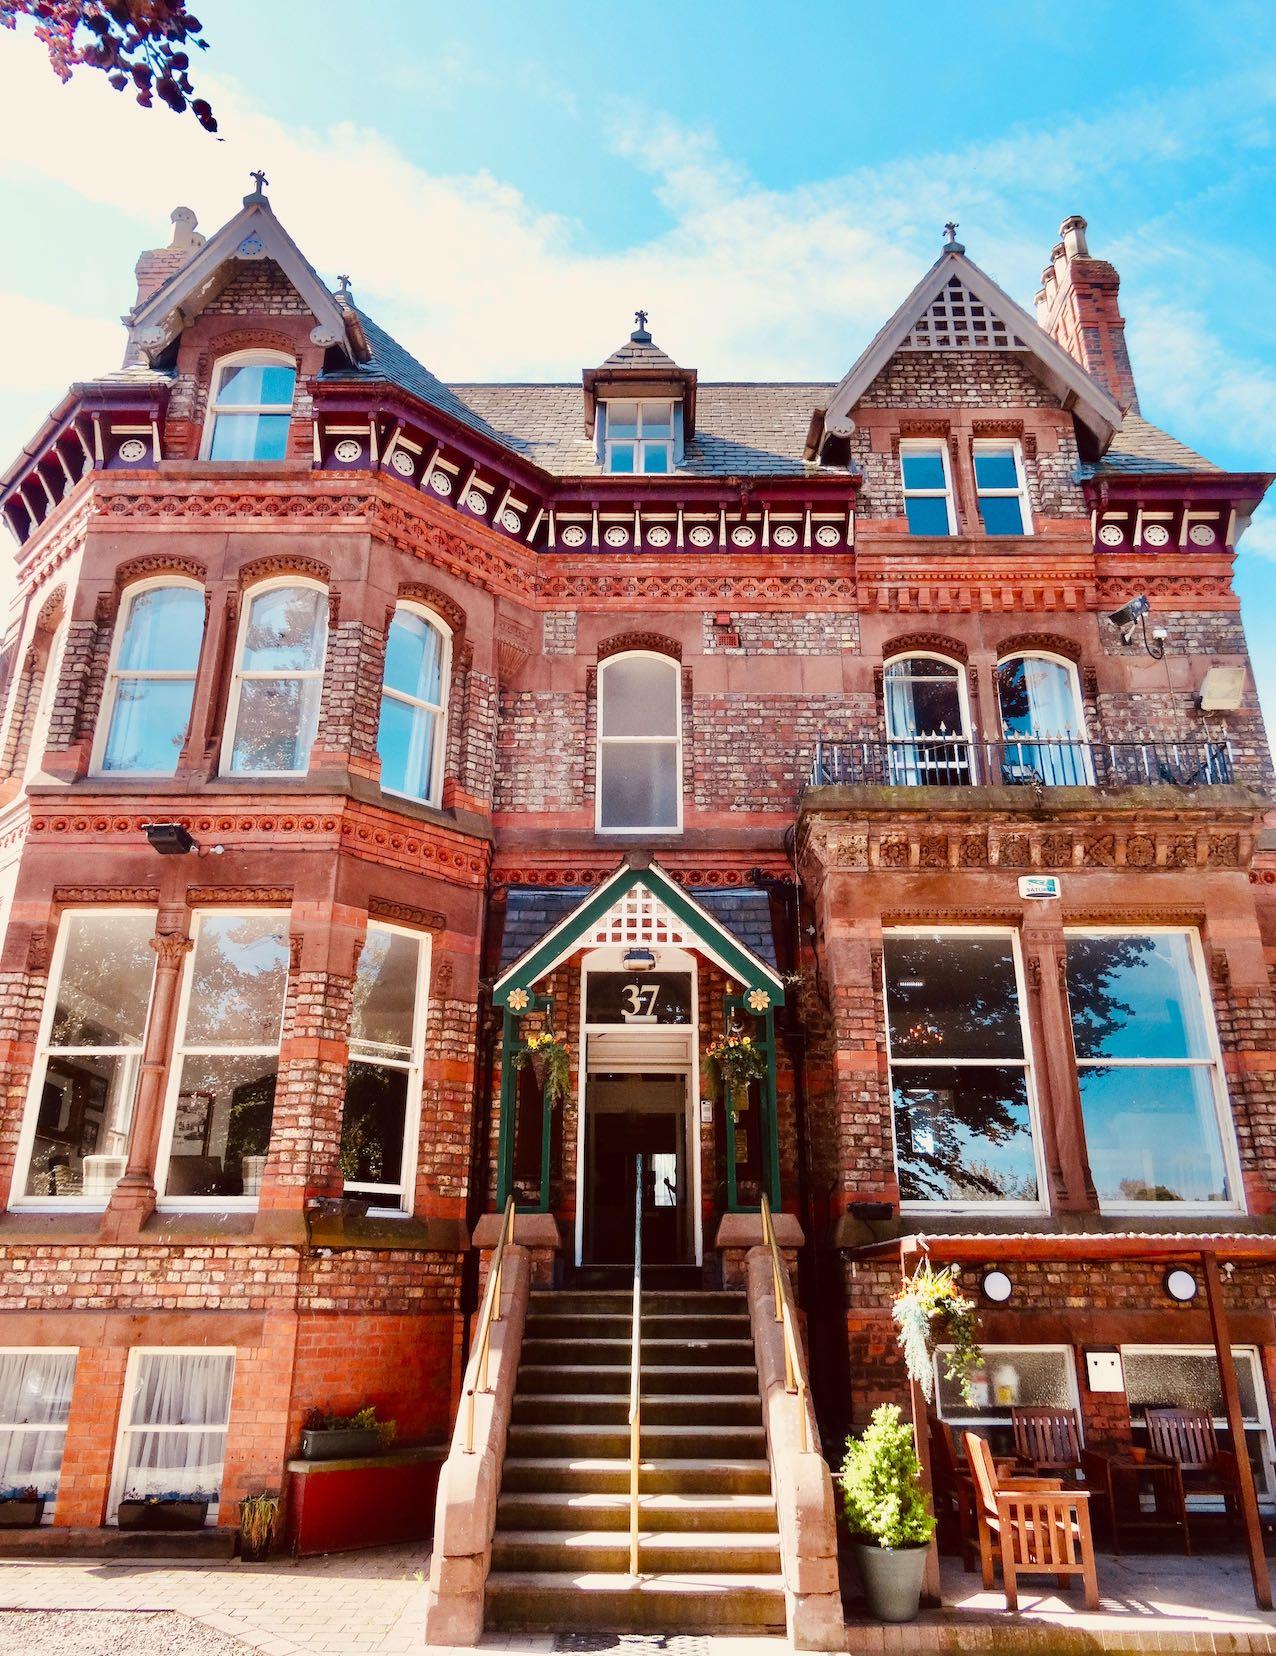 Sefton Park Hotel in Liverpool.